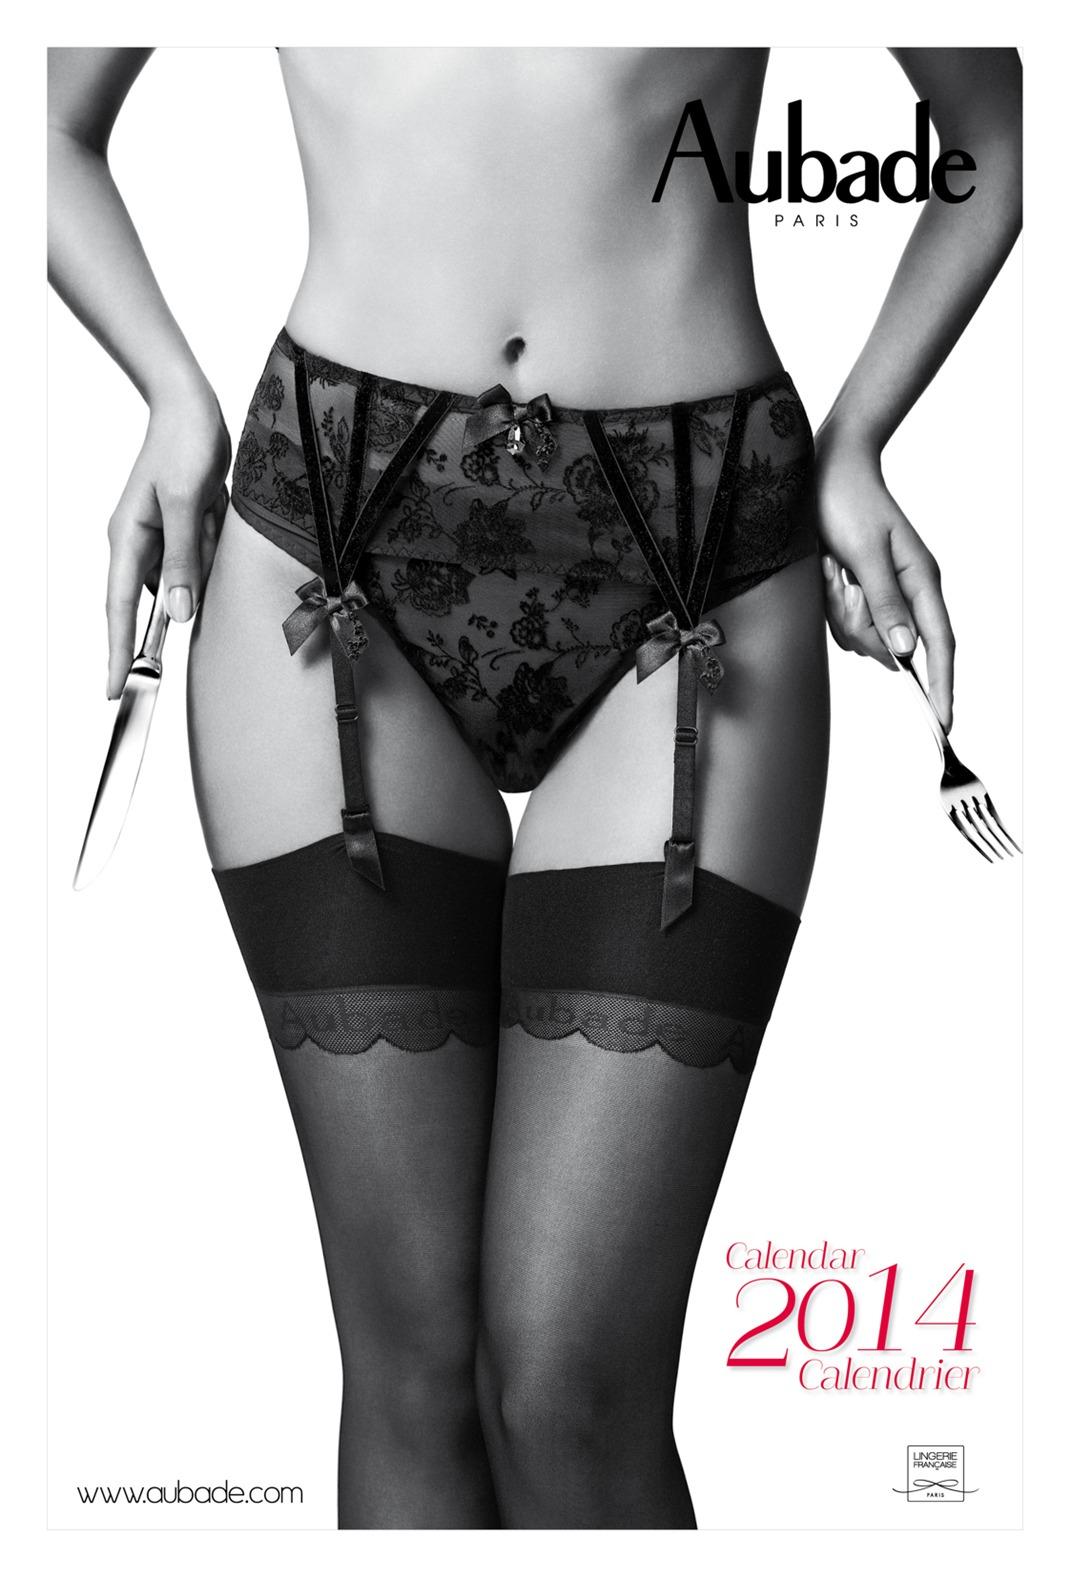 нижнее белье Aubade - календарь на 2014 год